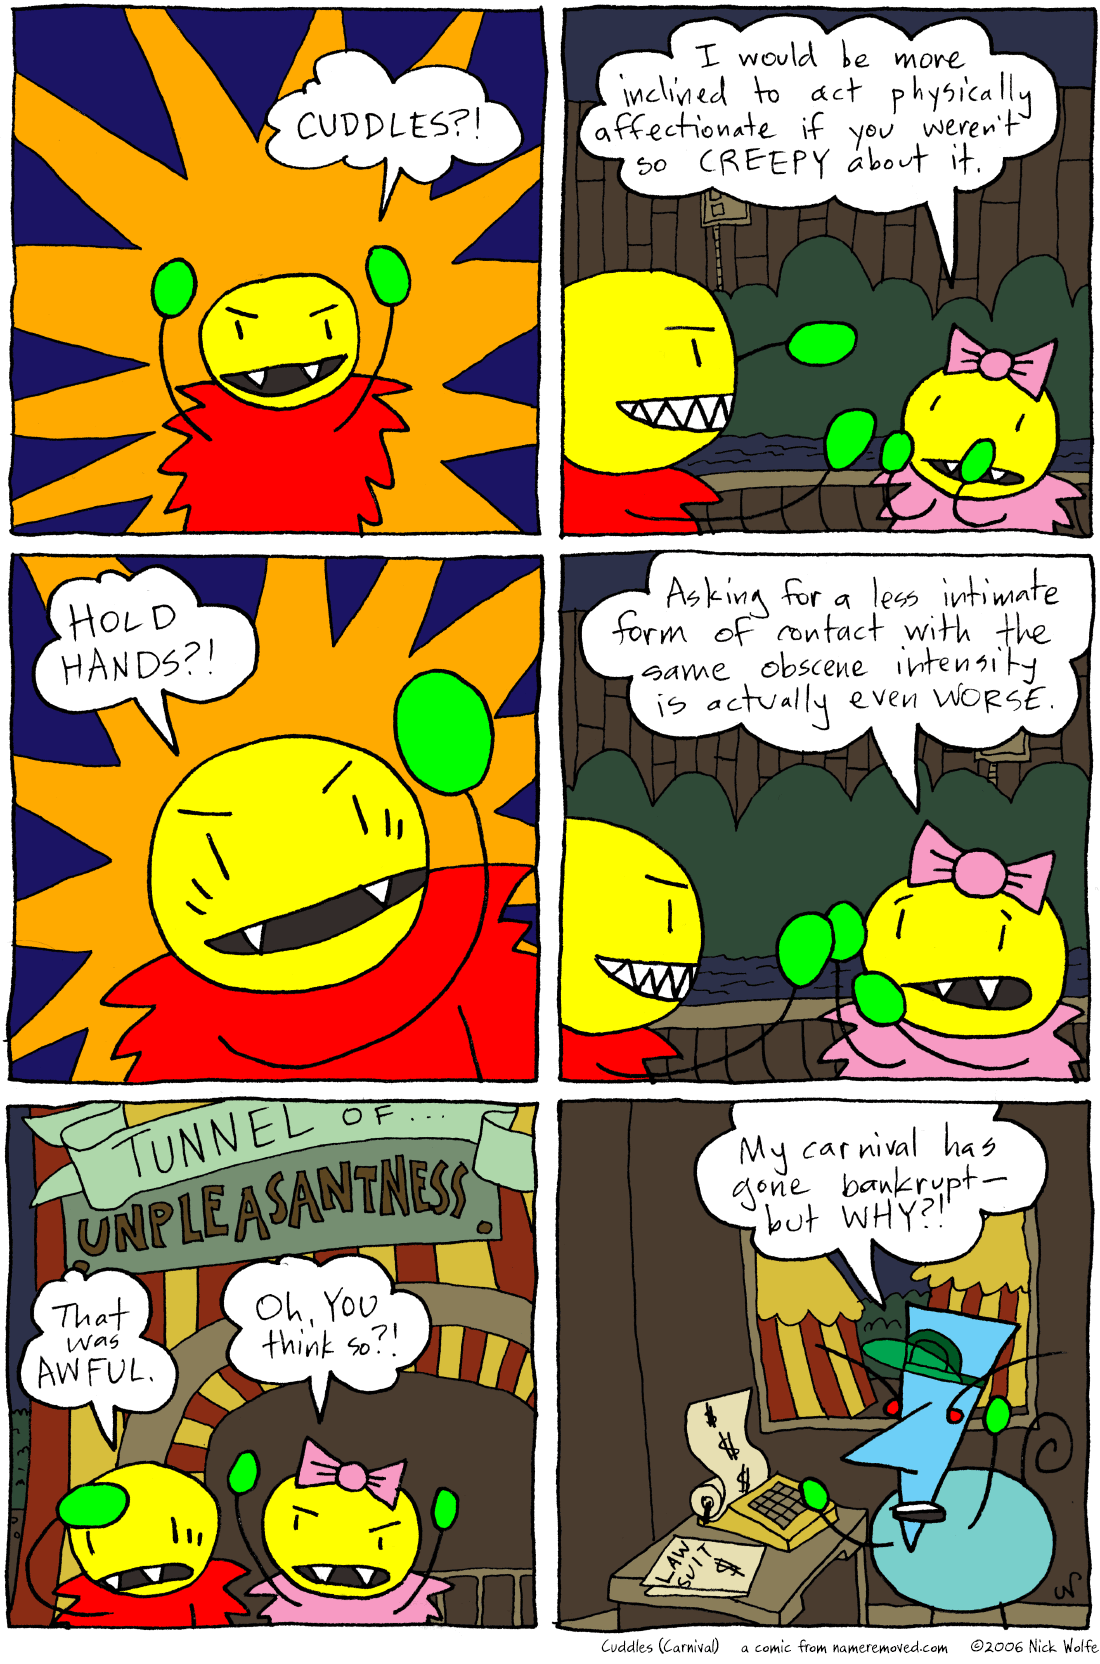 Cuddles (Carnival)